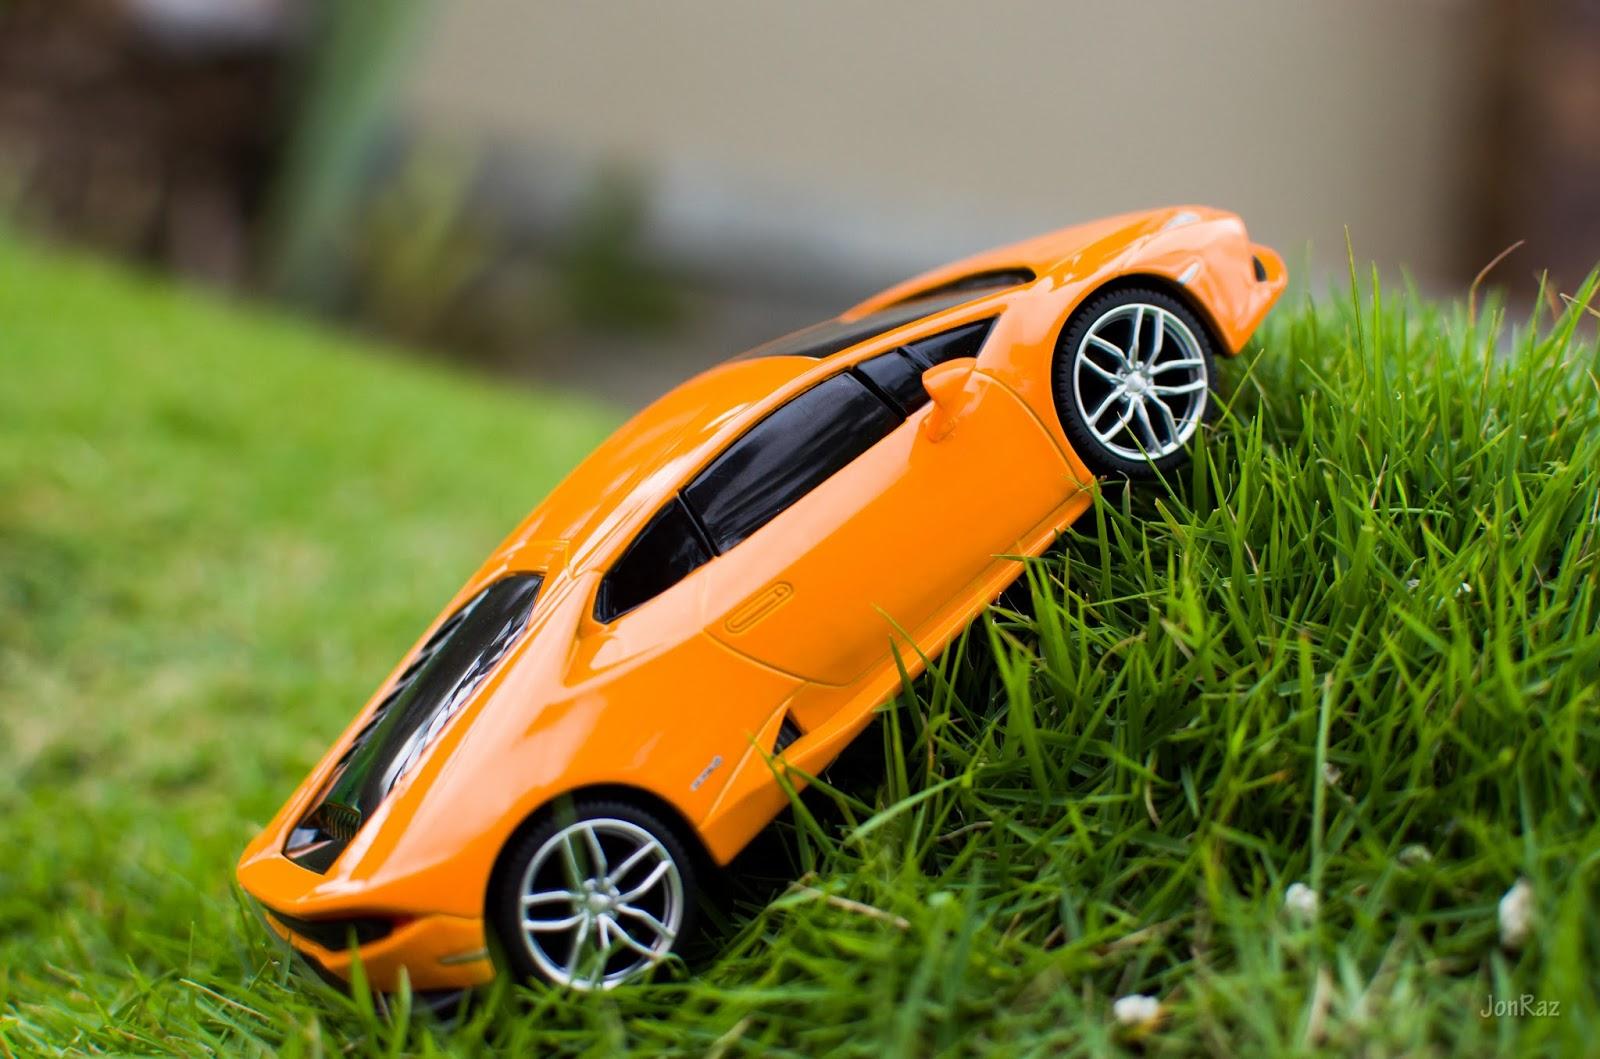 Petron Lamborghini Touch Toy Cars